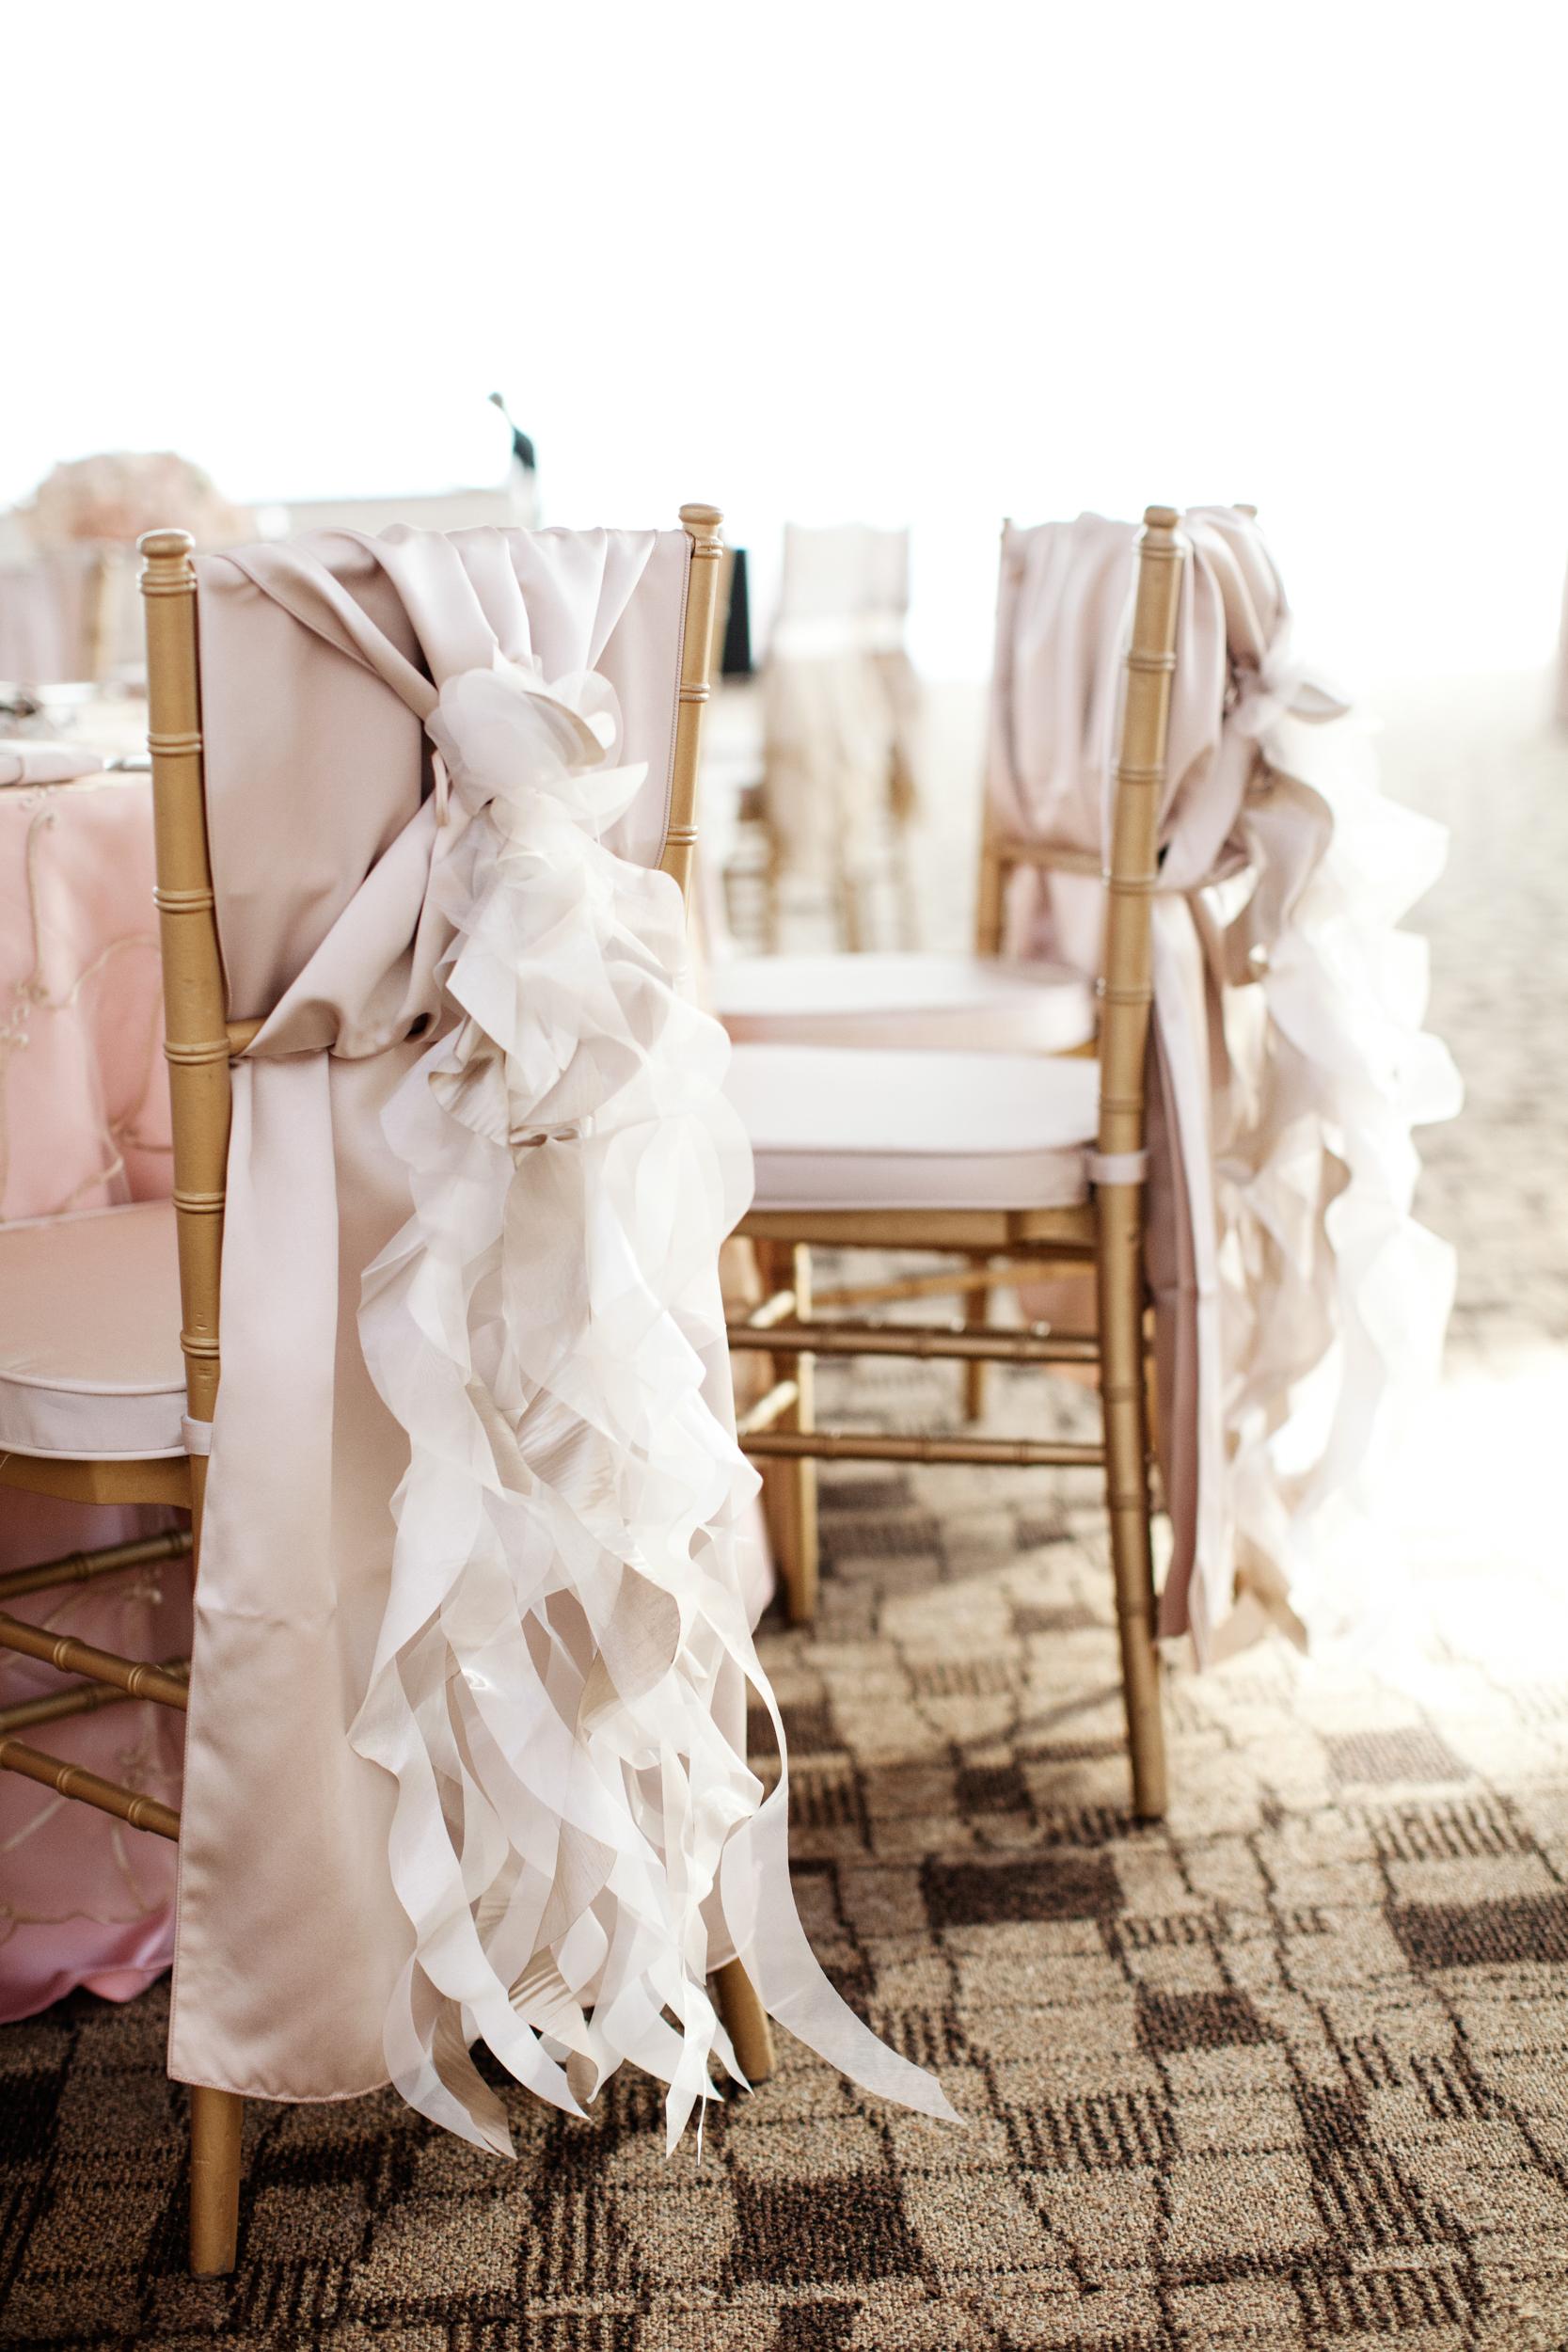 Ceci_New_York_Ceci_Style_Ceci_Johnson_Luxury_Lifestyle_Floral_Lace_Wedding_Letterpress_Inspiration_Design_Custom_Couture_Personalized_Invitations_-64.jpg